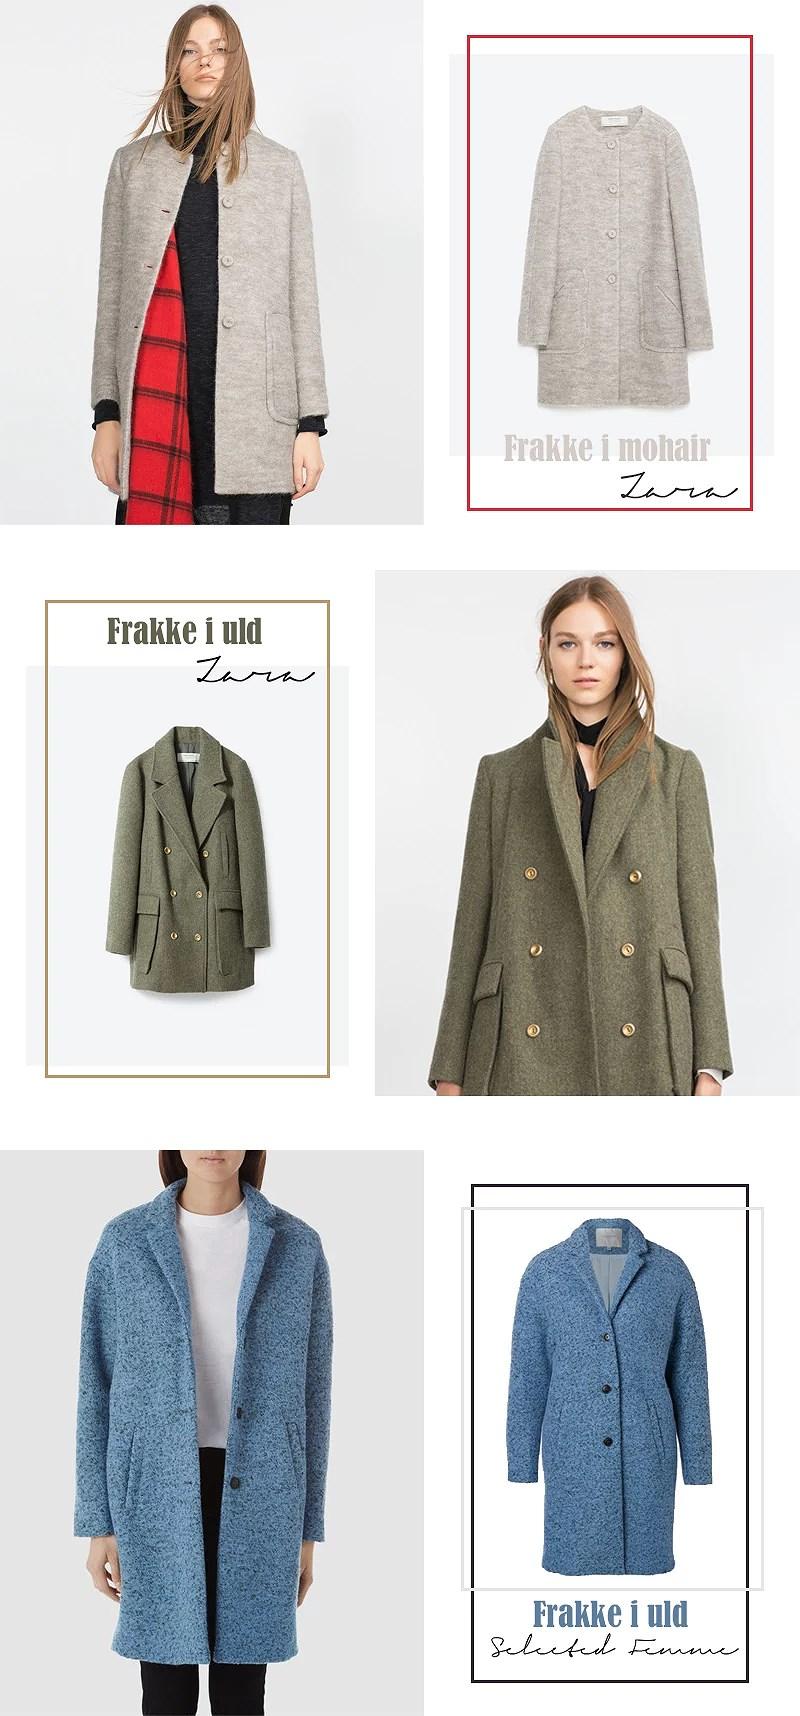 Forelsket i frakker